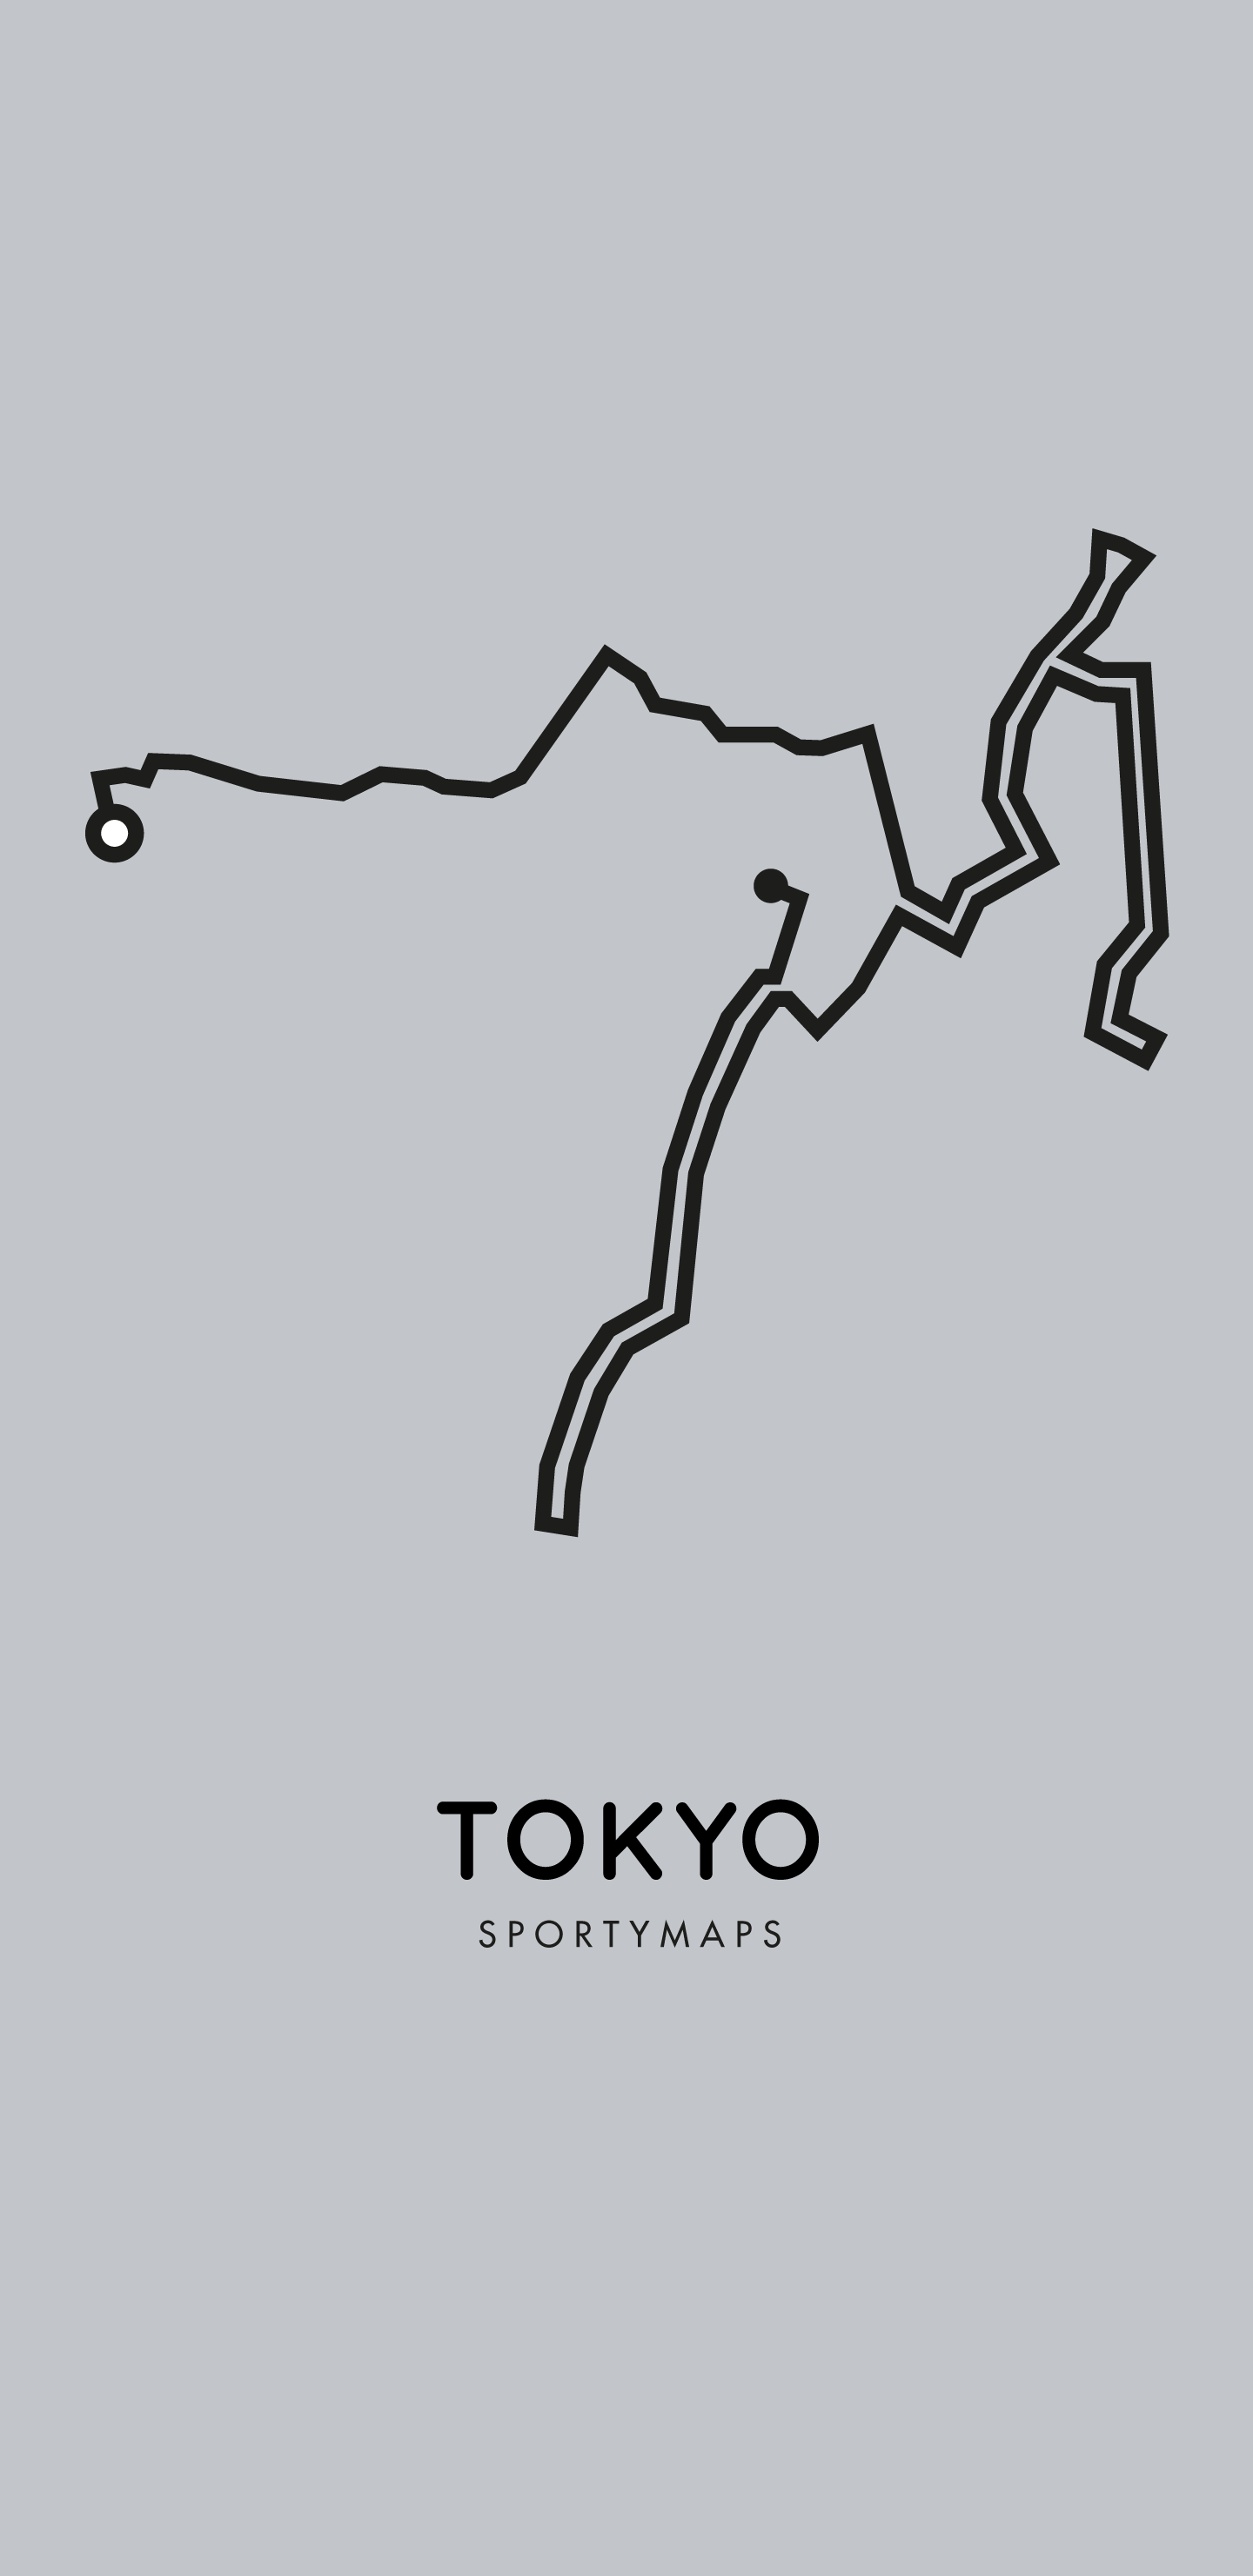 Sportymaps-Tokyo-marathon-gray